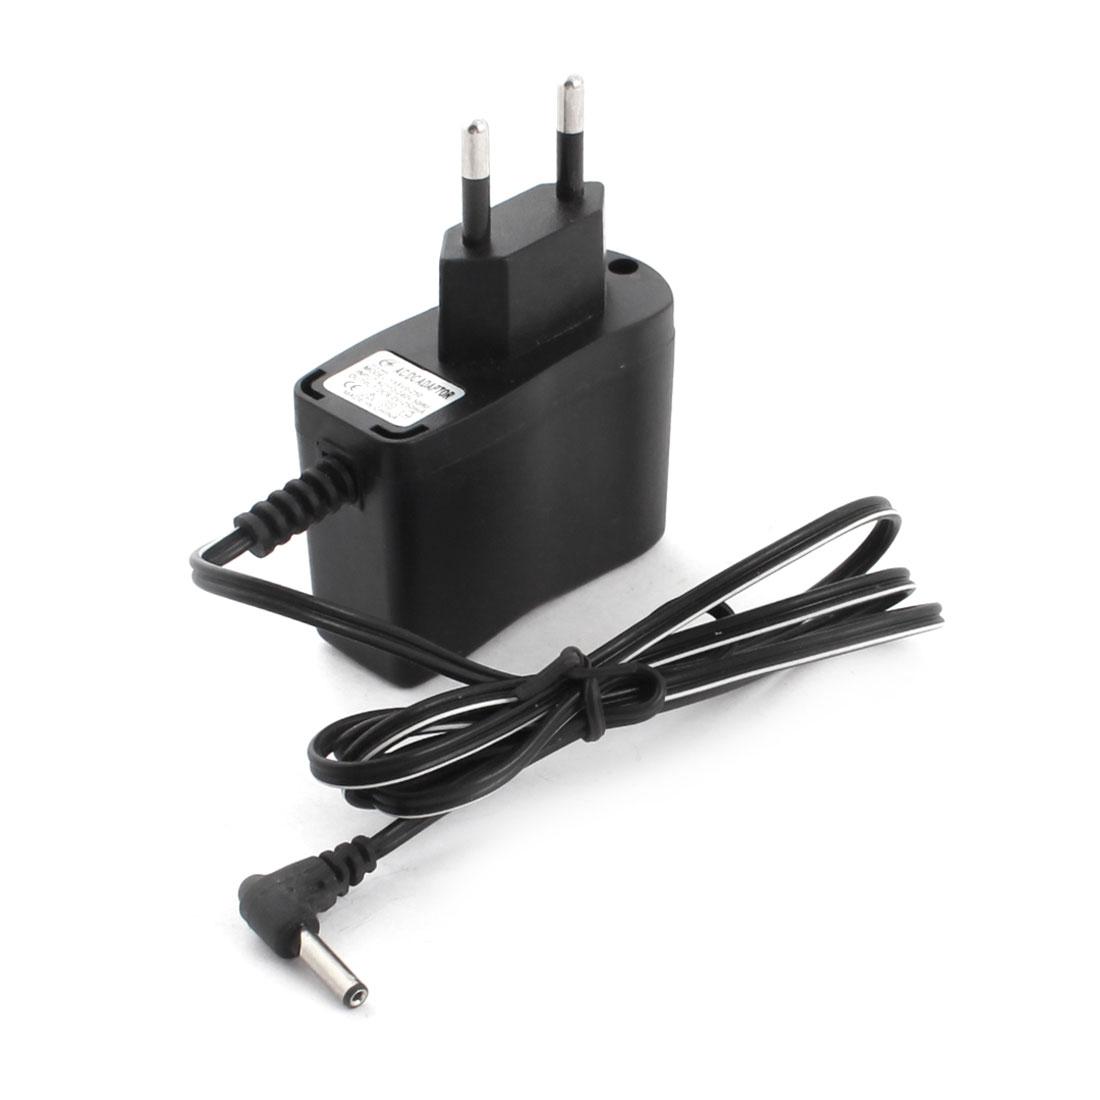 AC 110-240V EU Plug to 3.5x1.3mm DC Plug RC Model Car Battery Power Charger